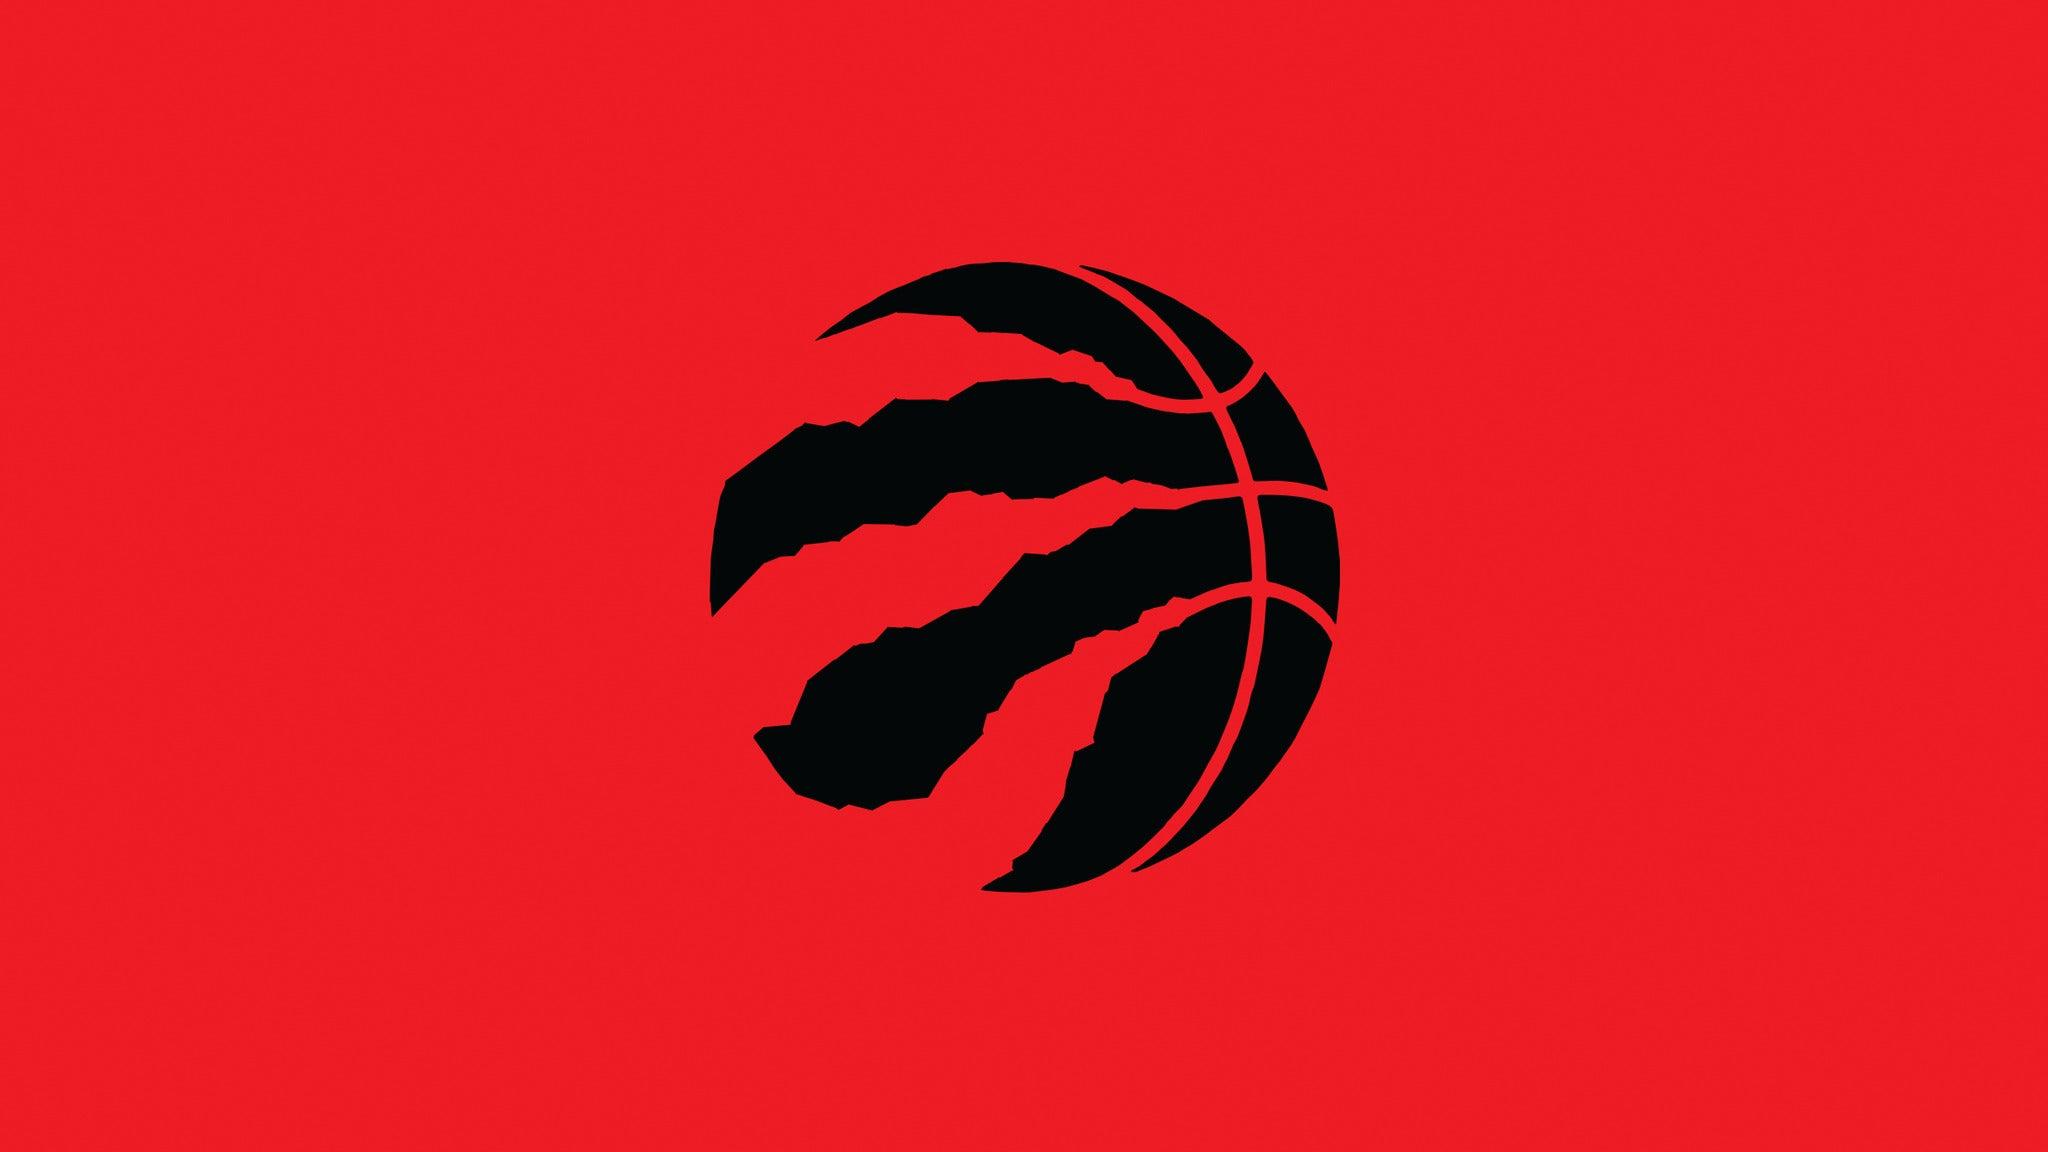 Toronto Raptors vs. Chicago Bulls